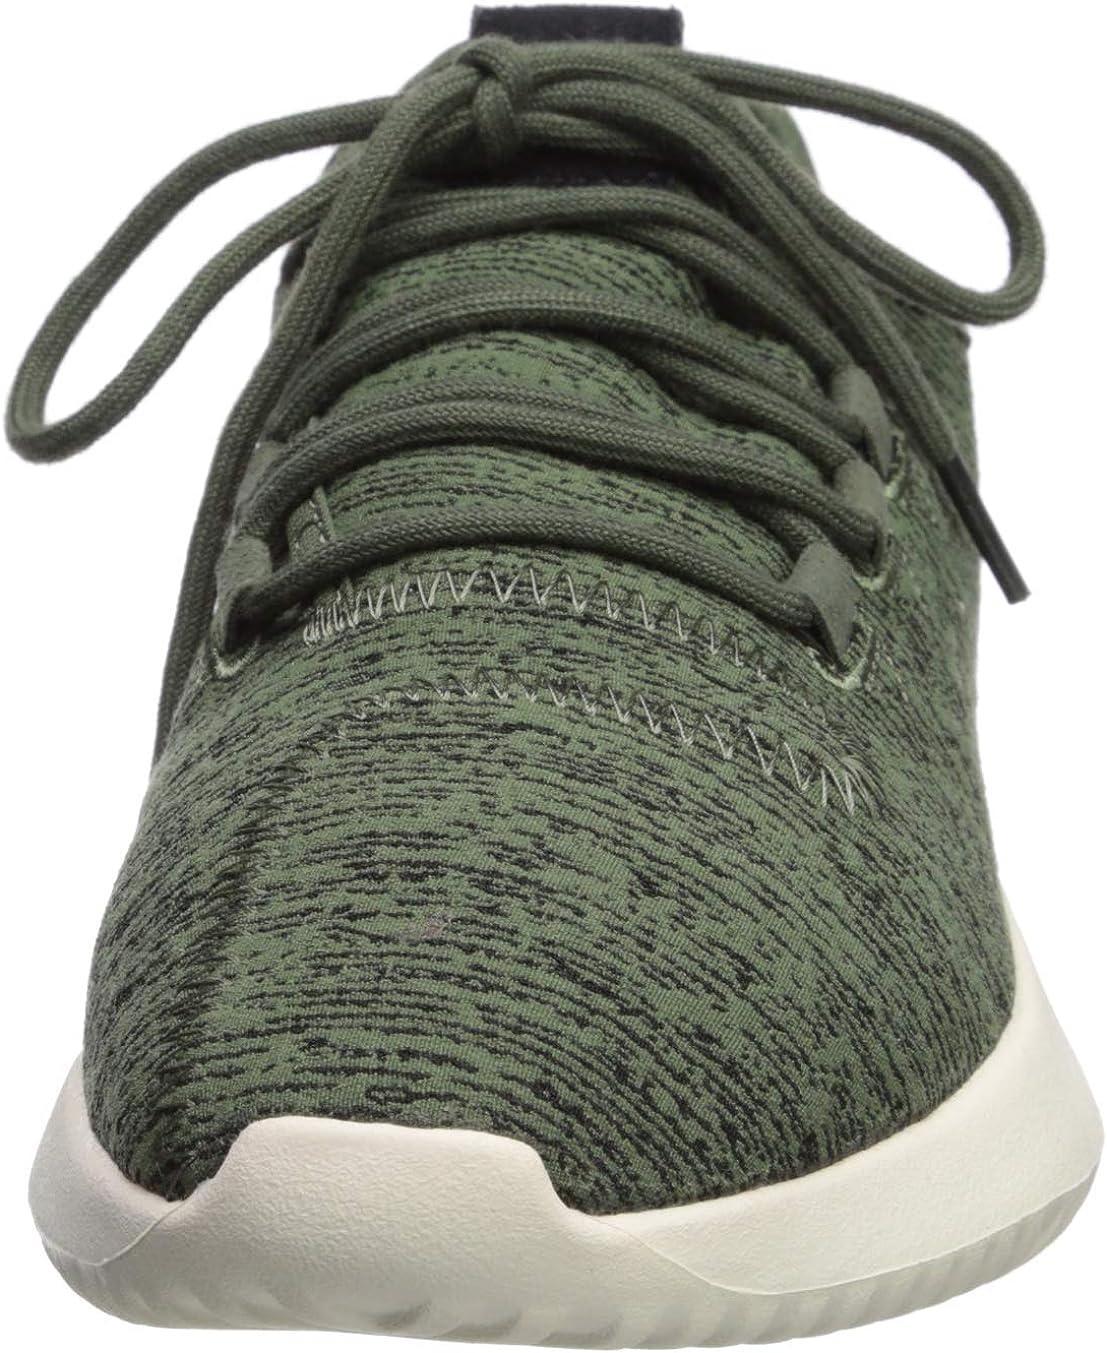 adidas Originals Women's Tubular Shadow W Fashion Sneaker St Major/Black/Off White